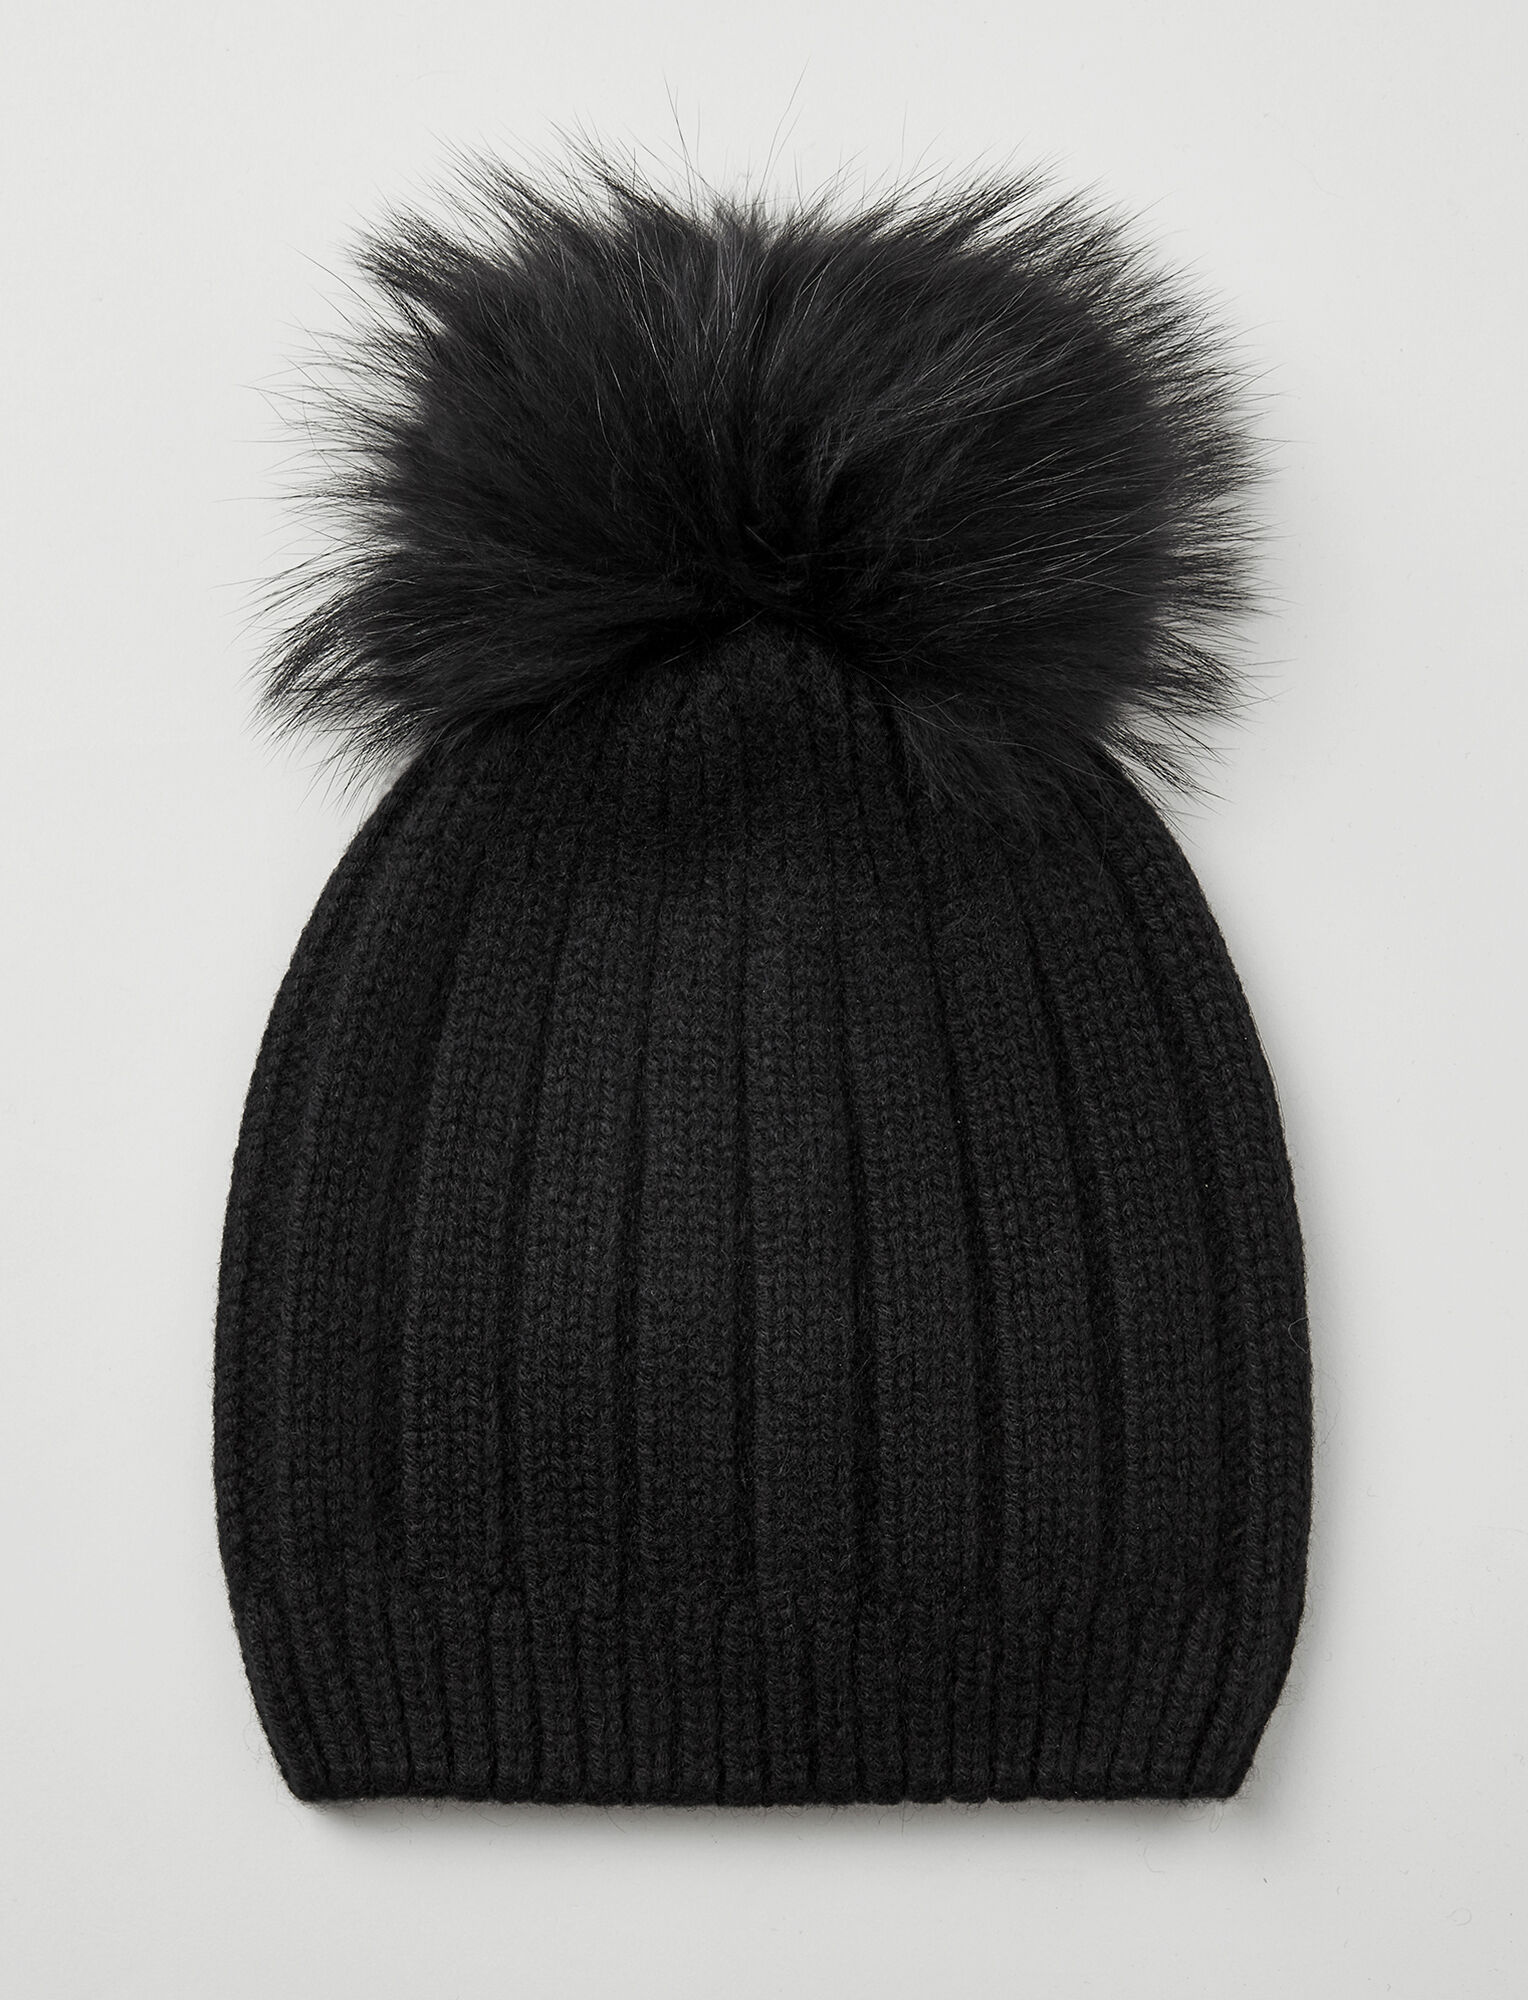 VIDA Leather Accent Tag - violet winter hats by VIDA c852np7v3n